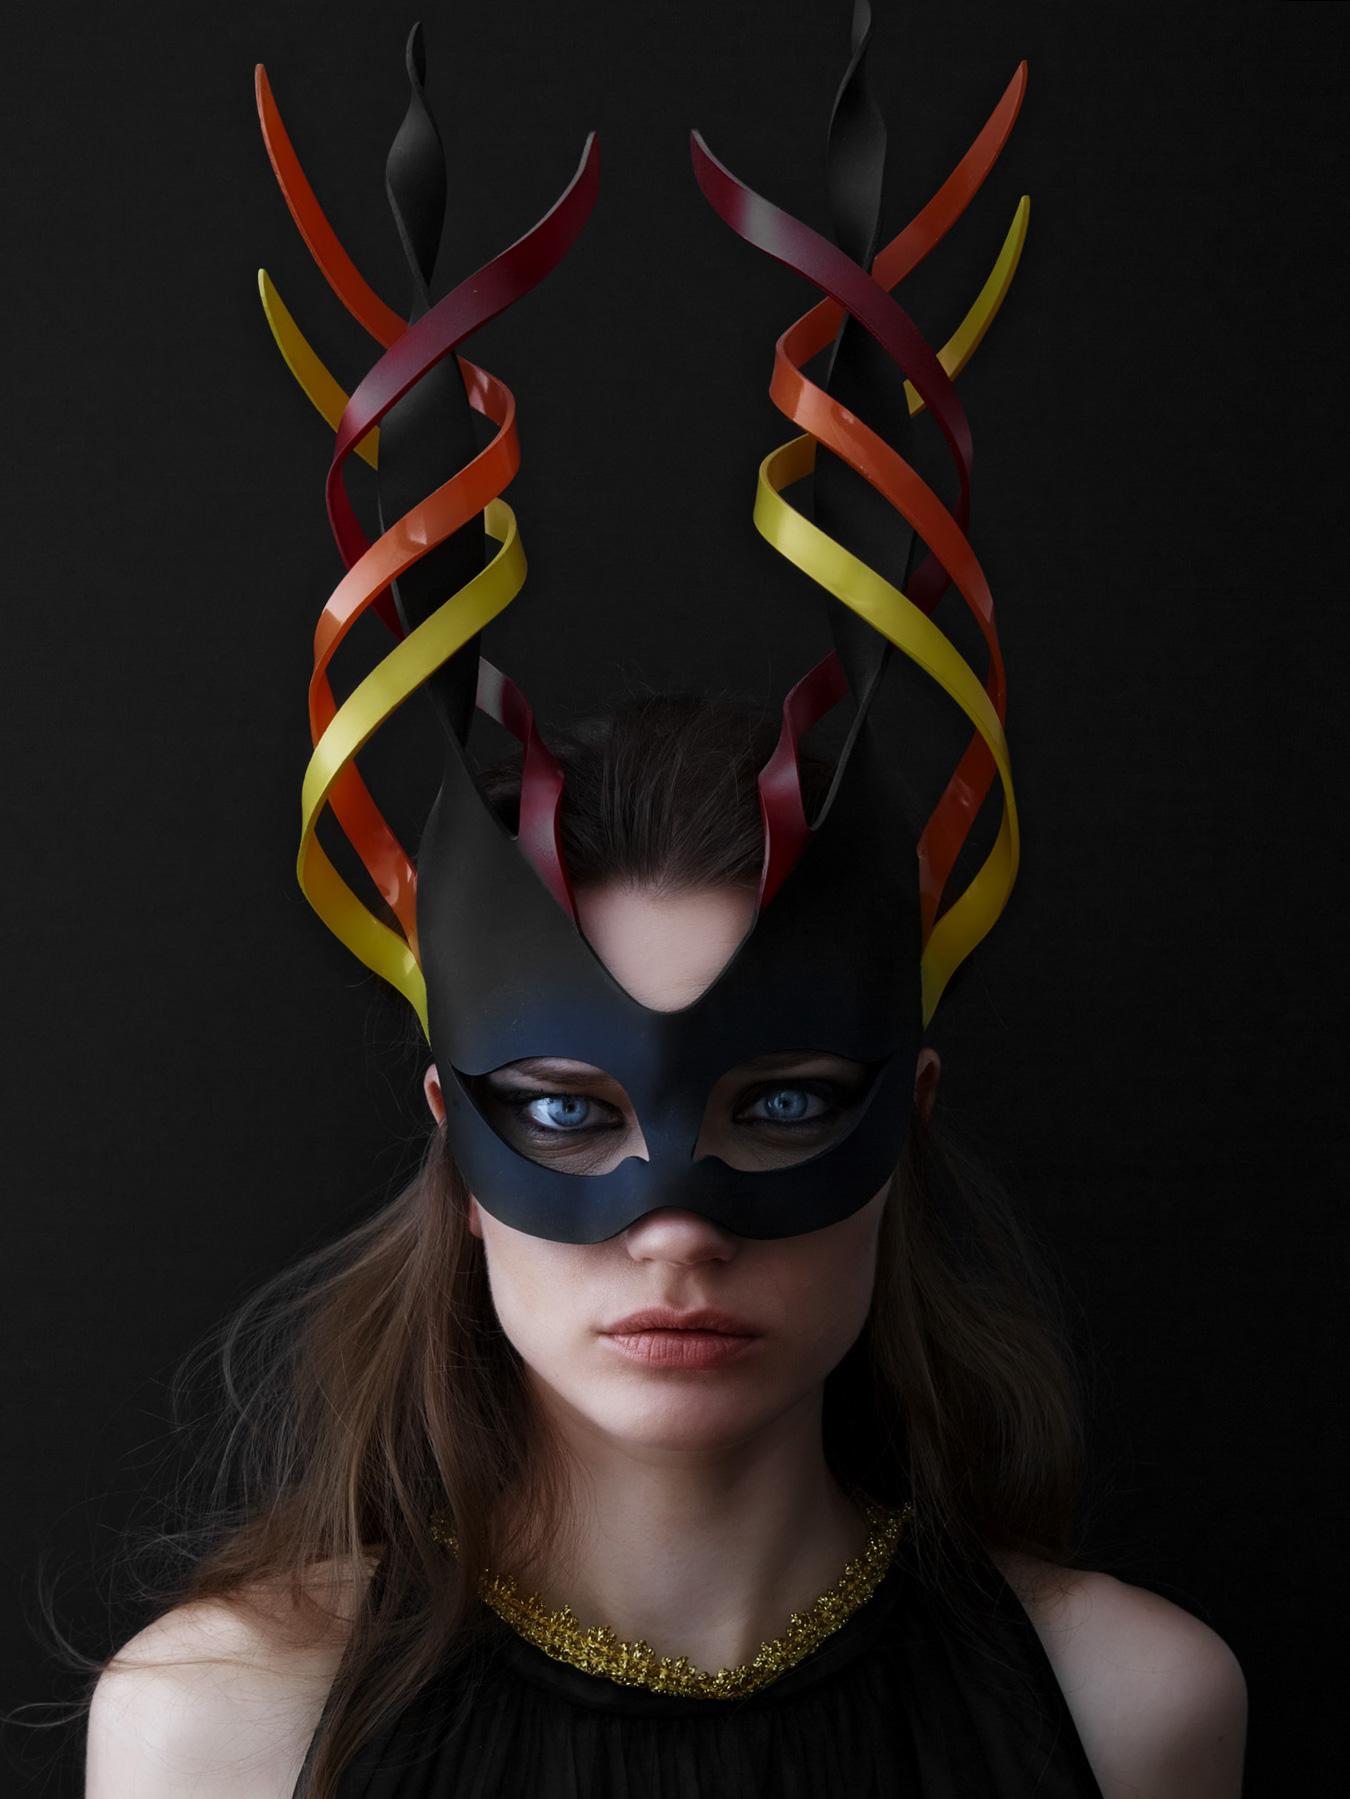 Swirl Twist Long Horns Mask - Red/Orange/Yellow